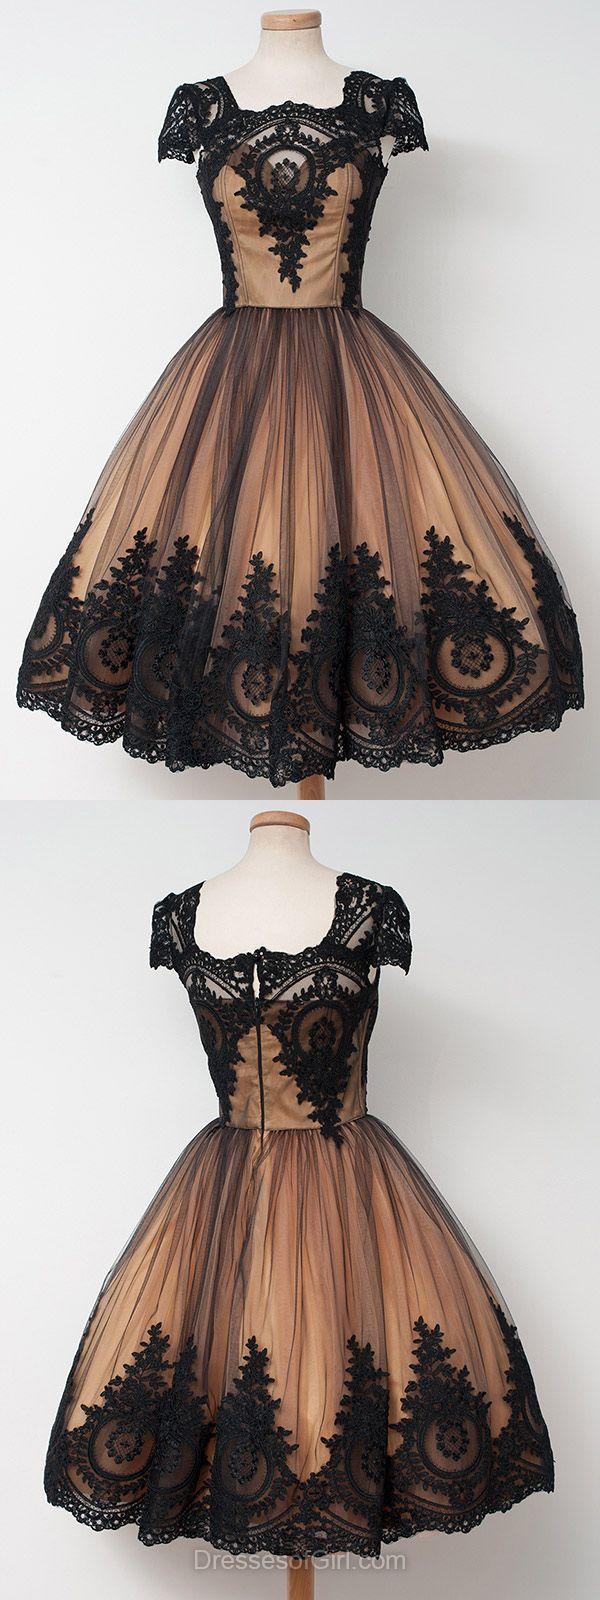 womens dresses - closetter | vestidos, belos vestidos